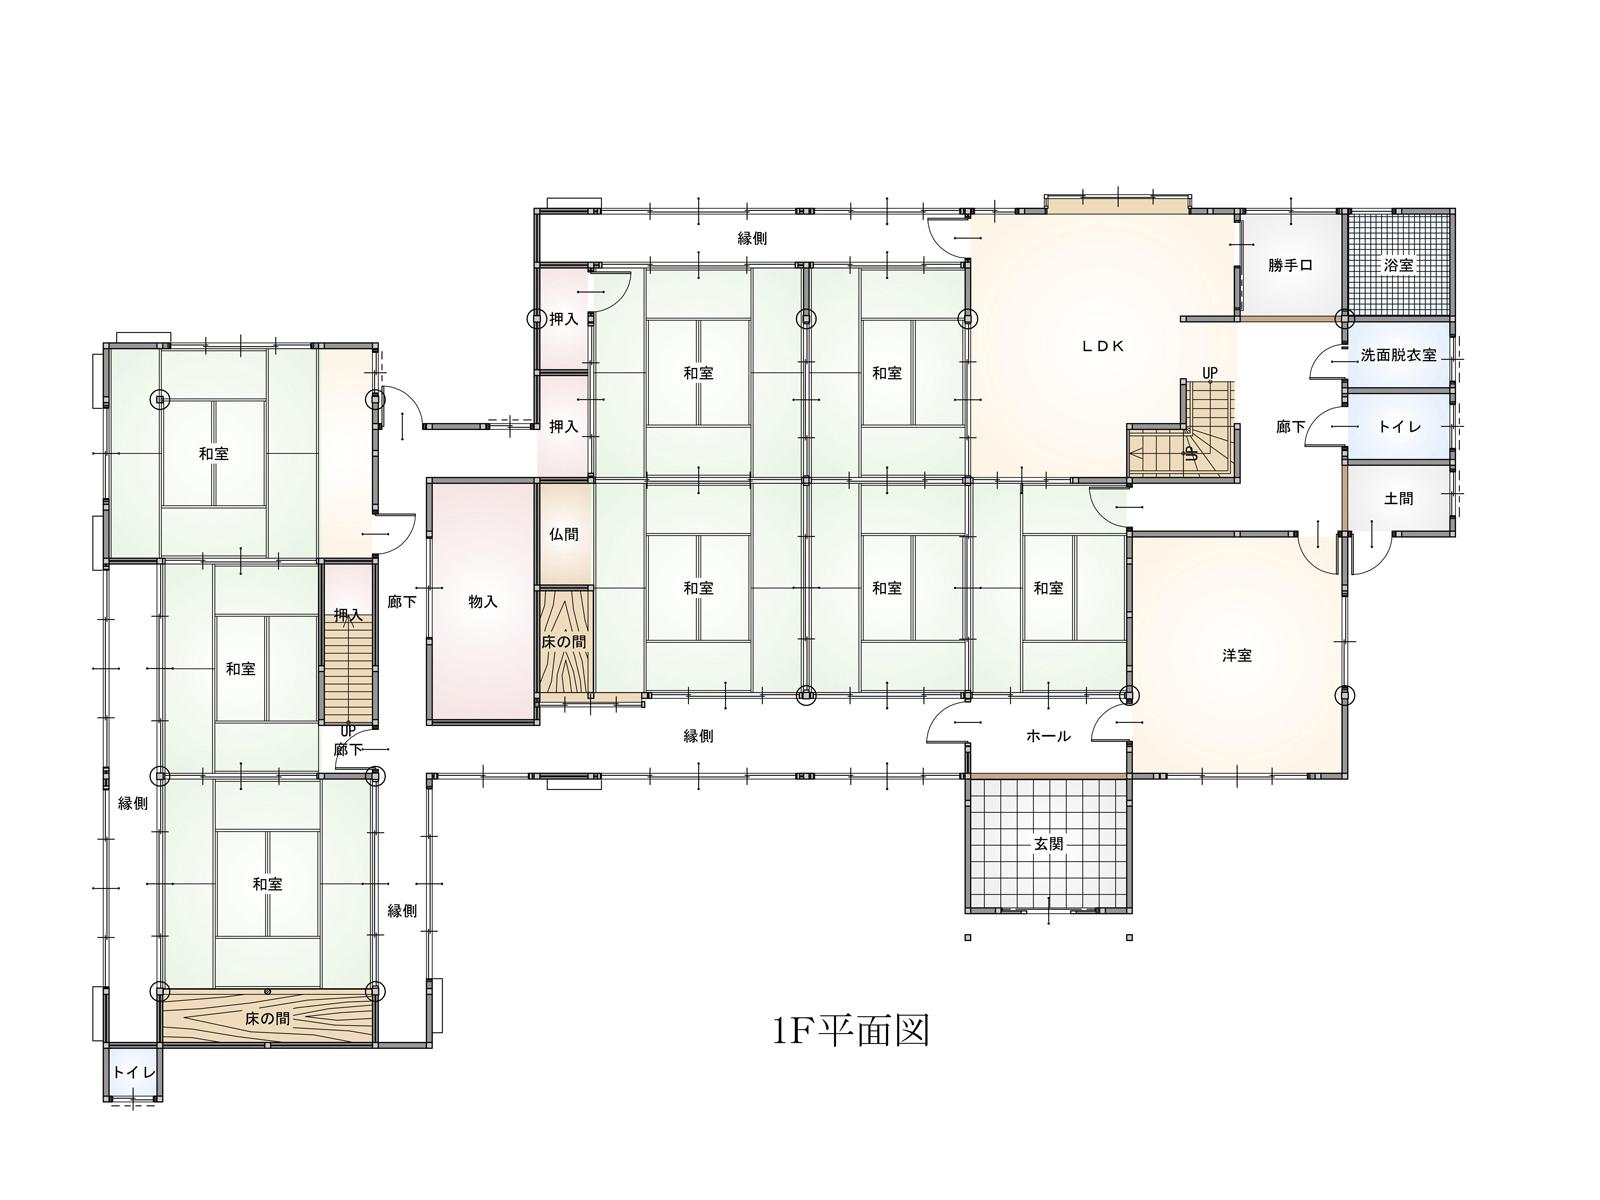 敏満寺物件平1F面図 © 株式会社丸由 | 建築/屋根工事業、宅建業、太陽光発電工事業を専門とする建設会社です